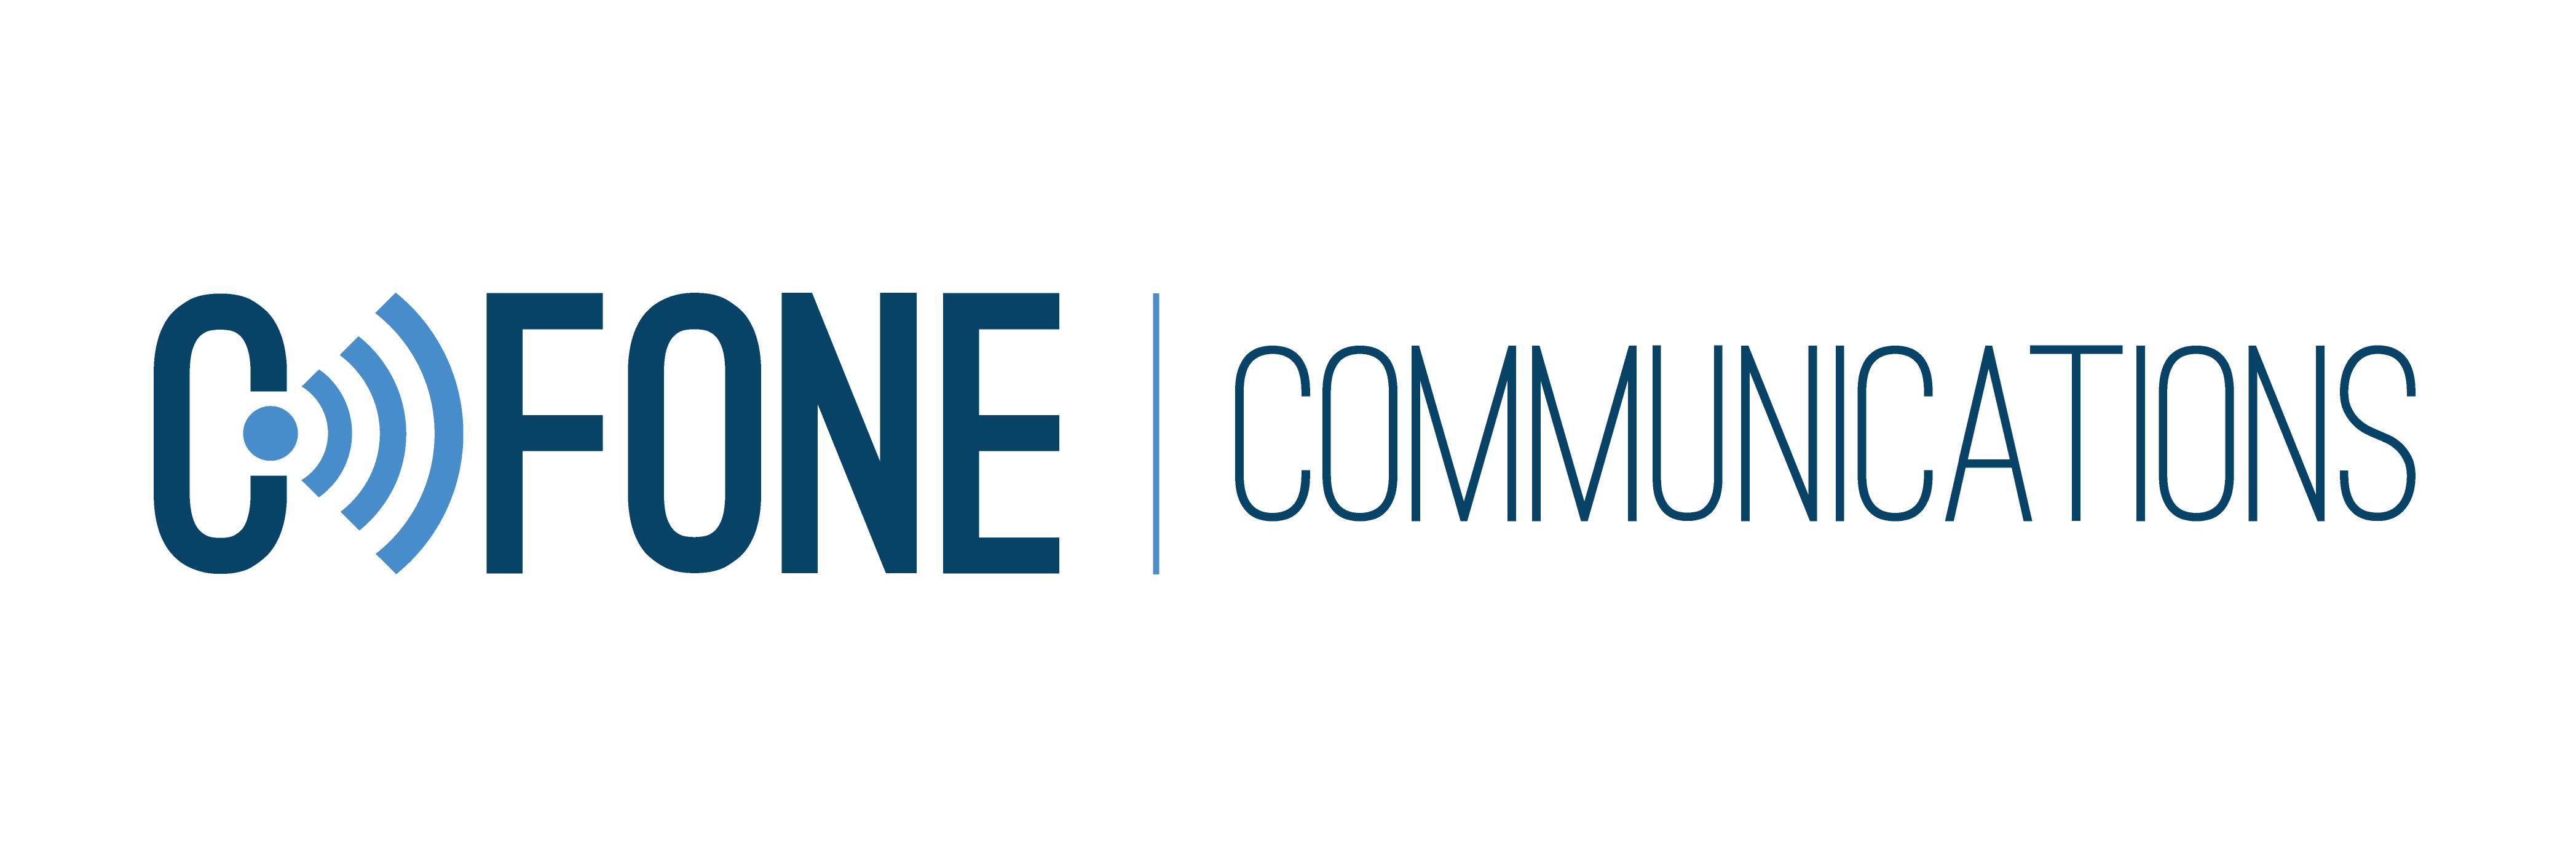 CFone VoIP logo